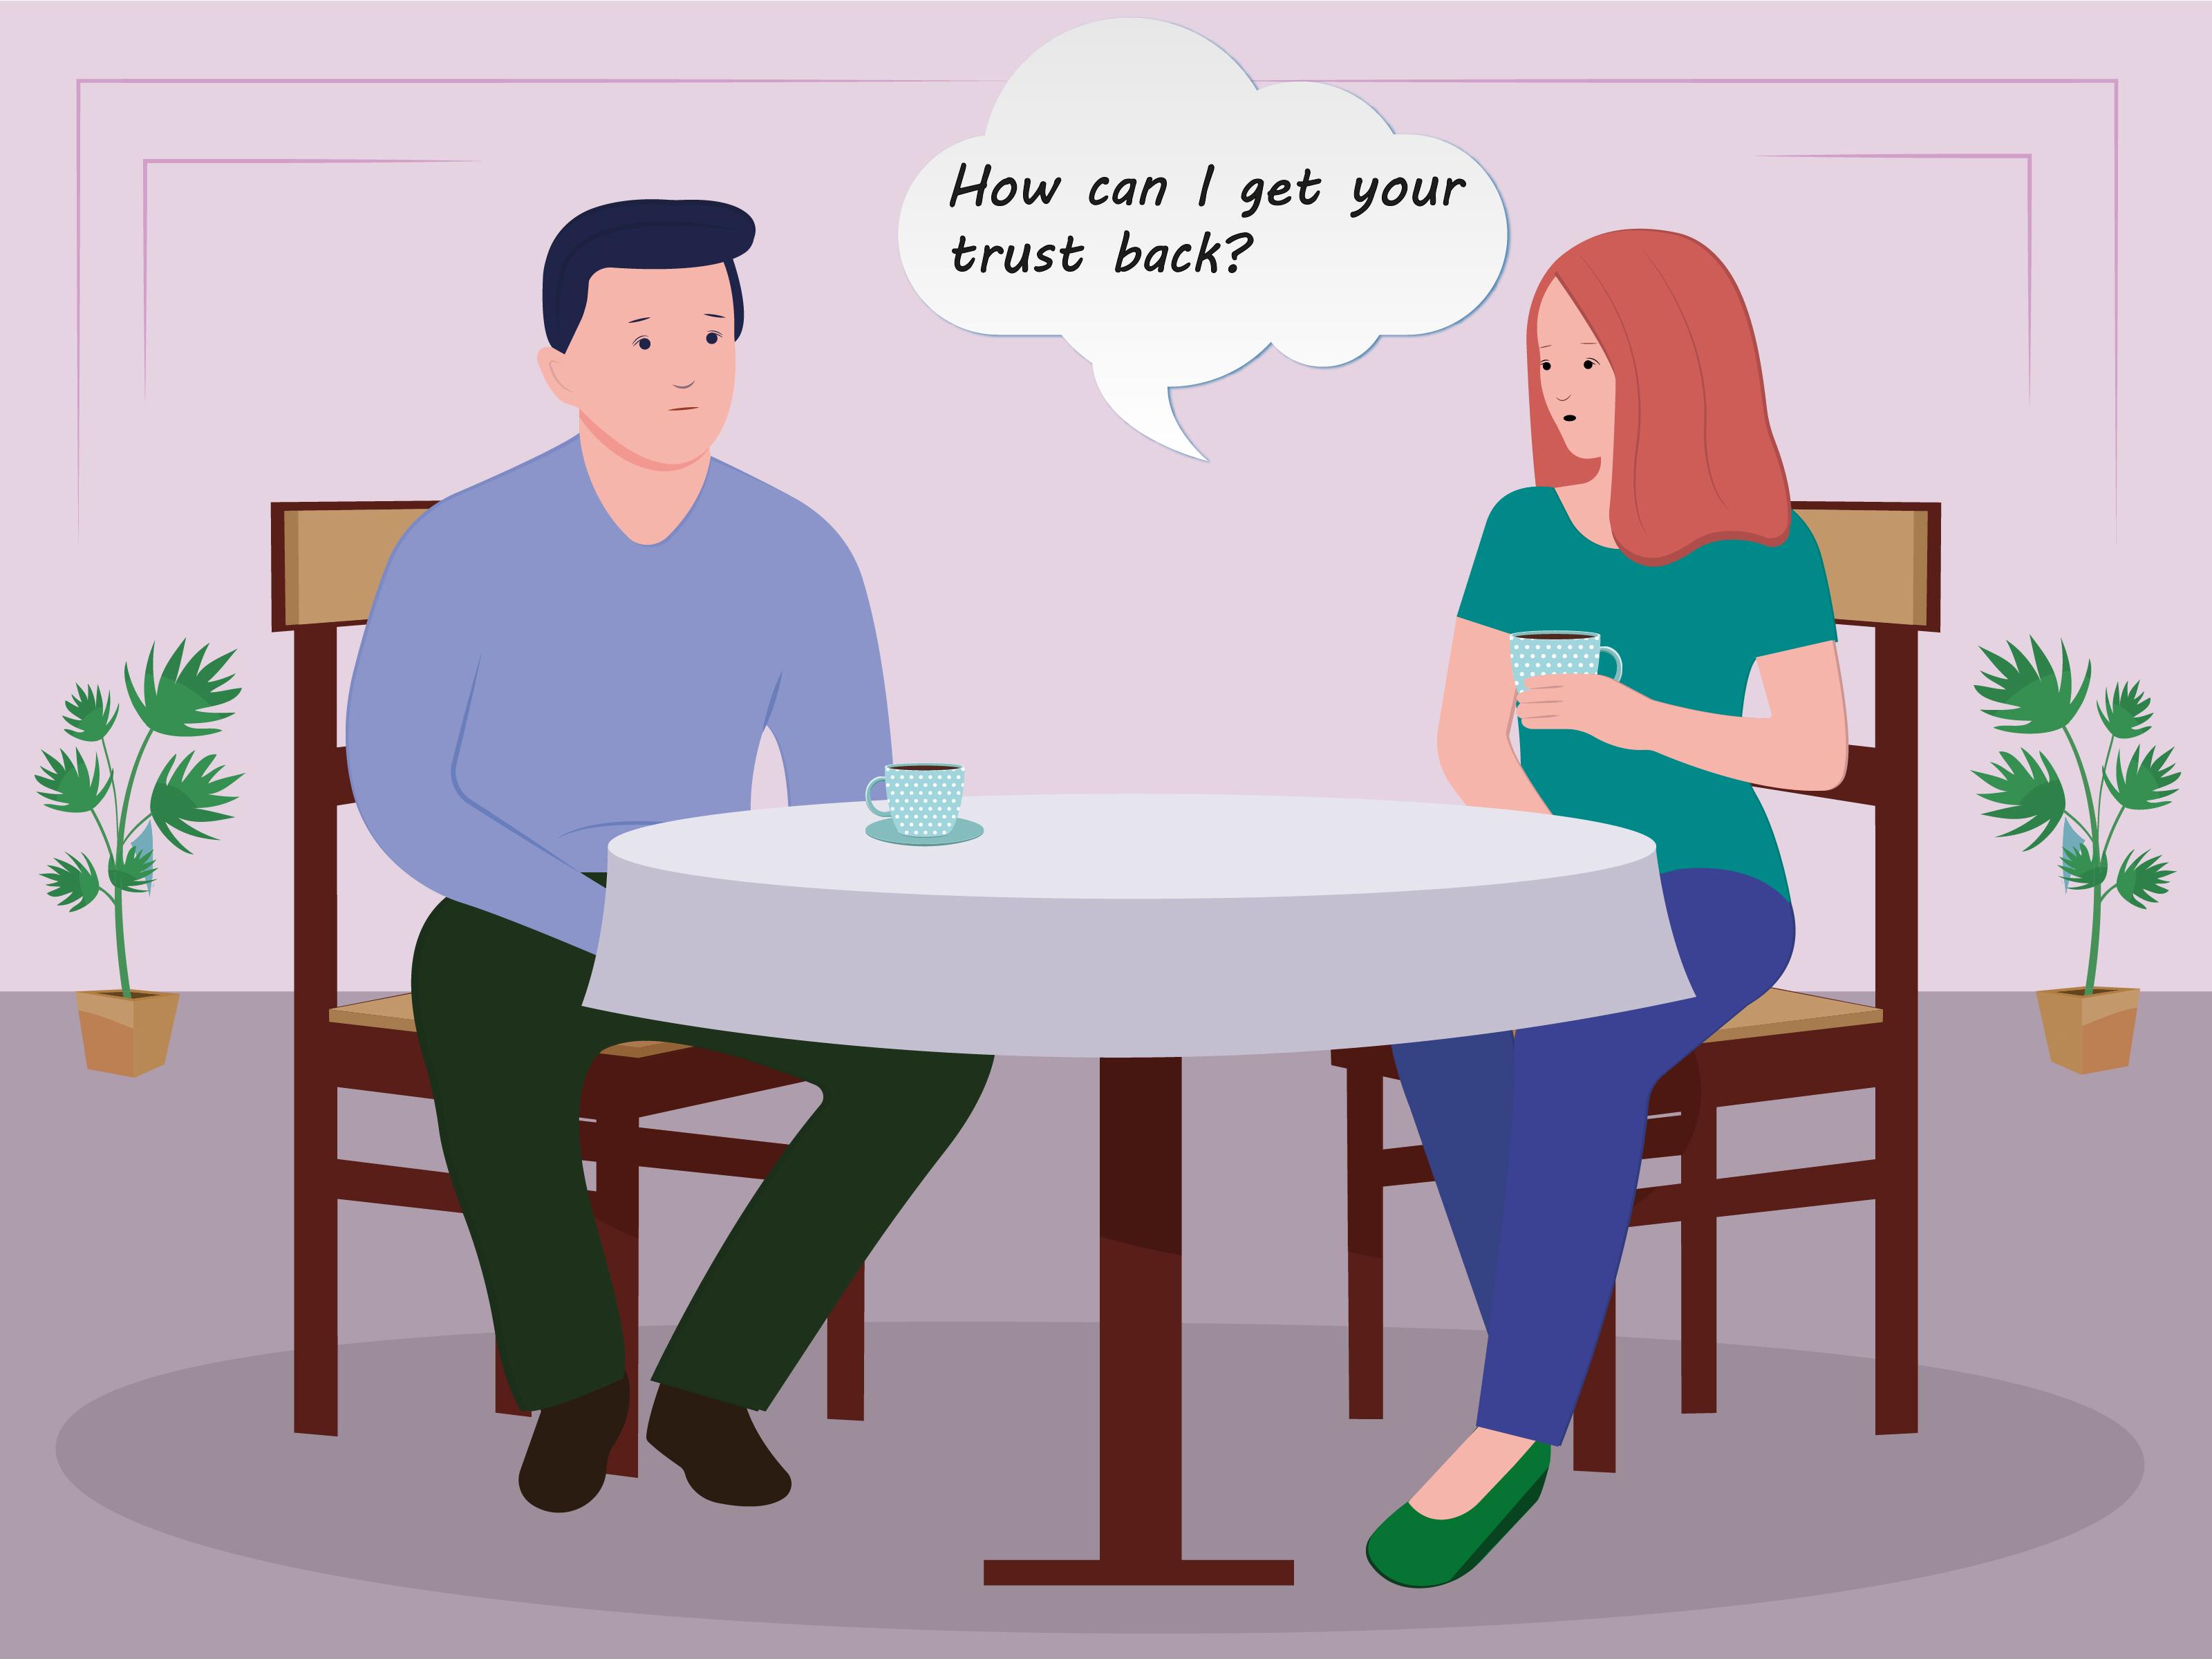 3 Ways To Gain Parental Trust As A Teen